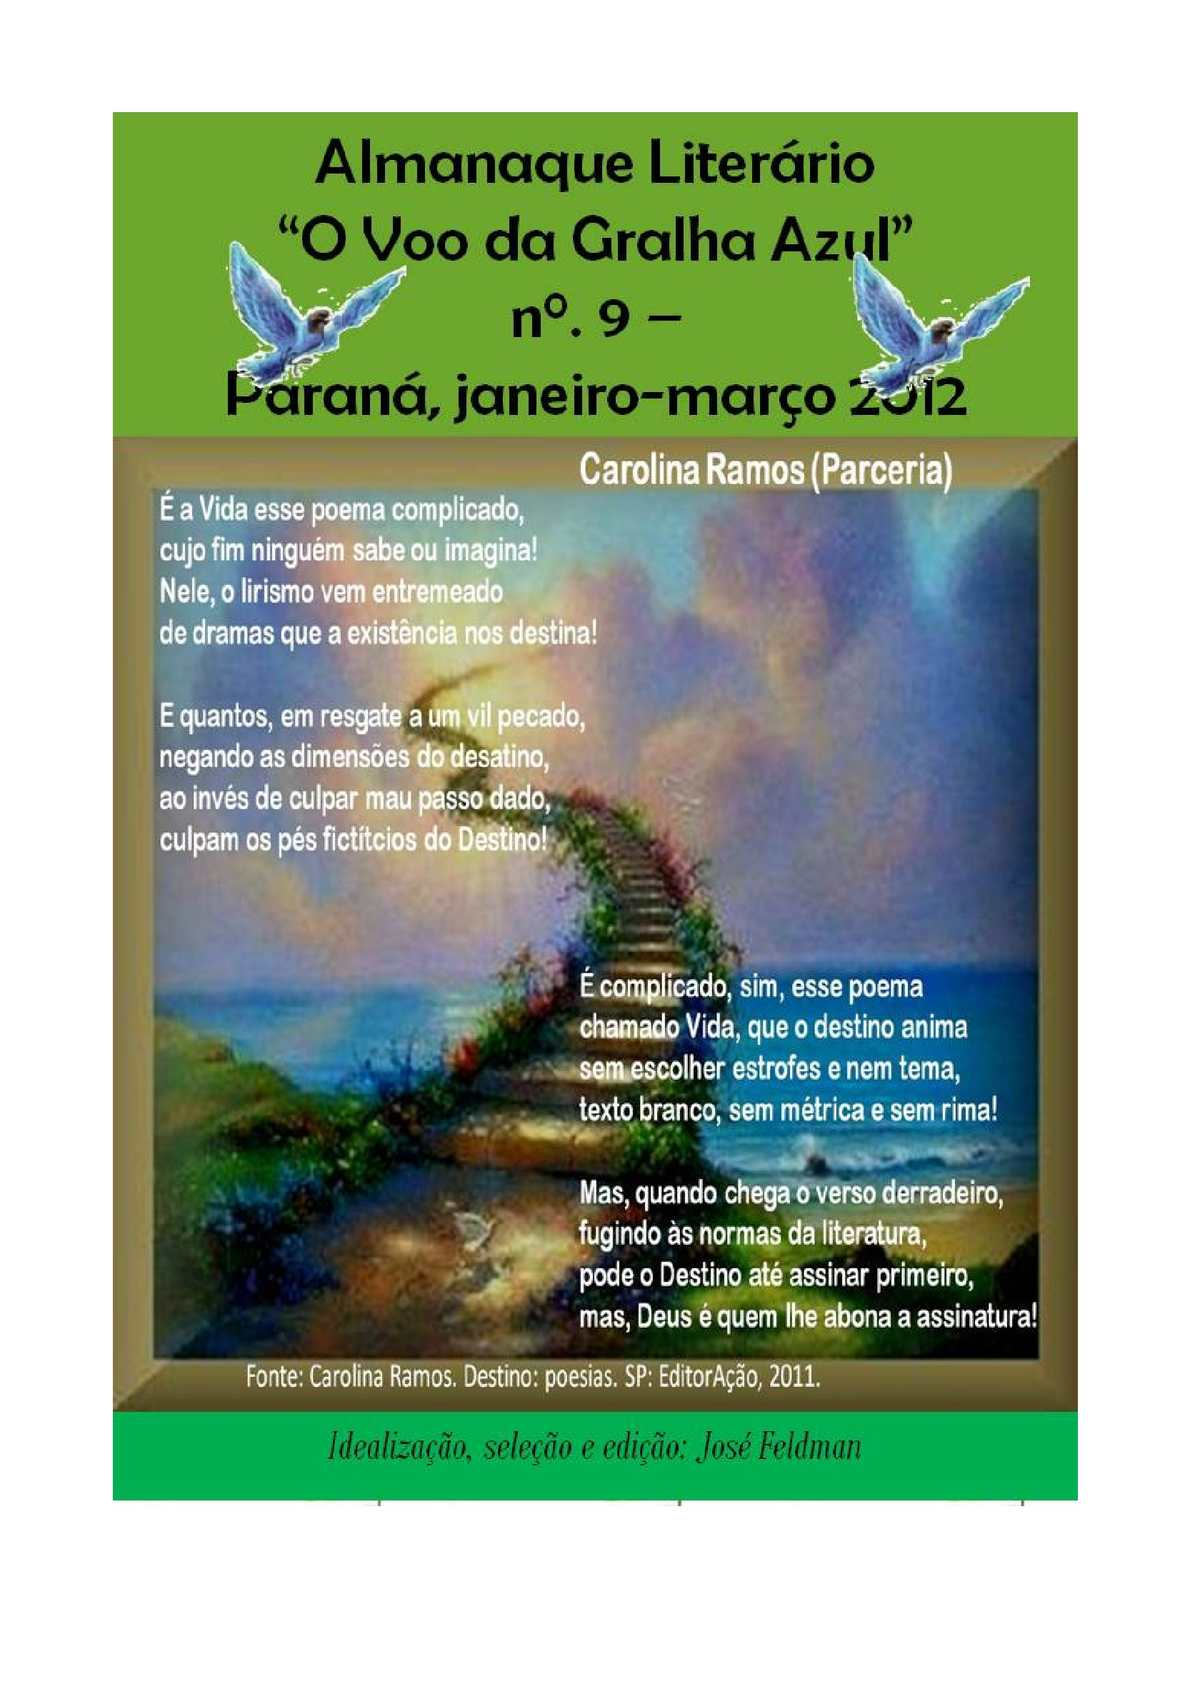 4eab34e71a7 Calaméo - ALMANAQUE O VÔO DA GRALHA AZUL Nº9 Editor  José Feldman - Pr